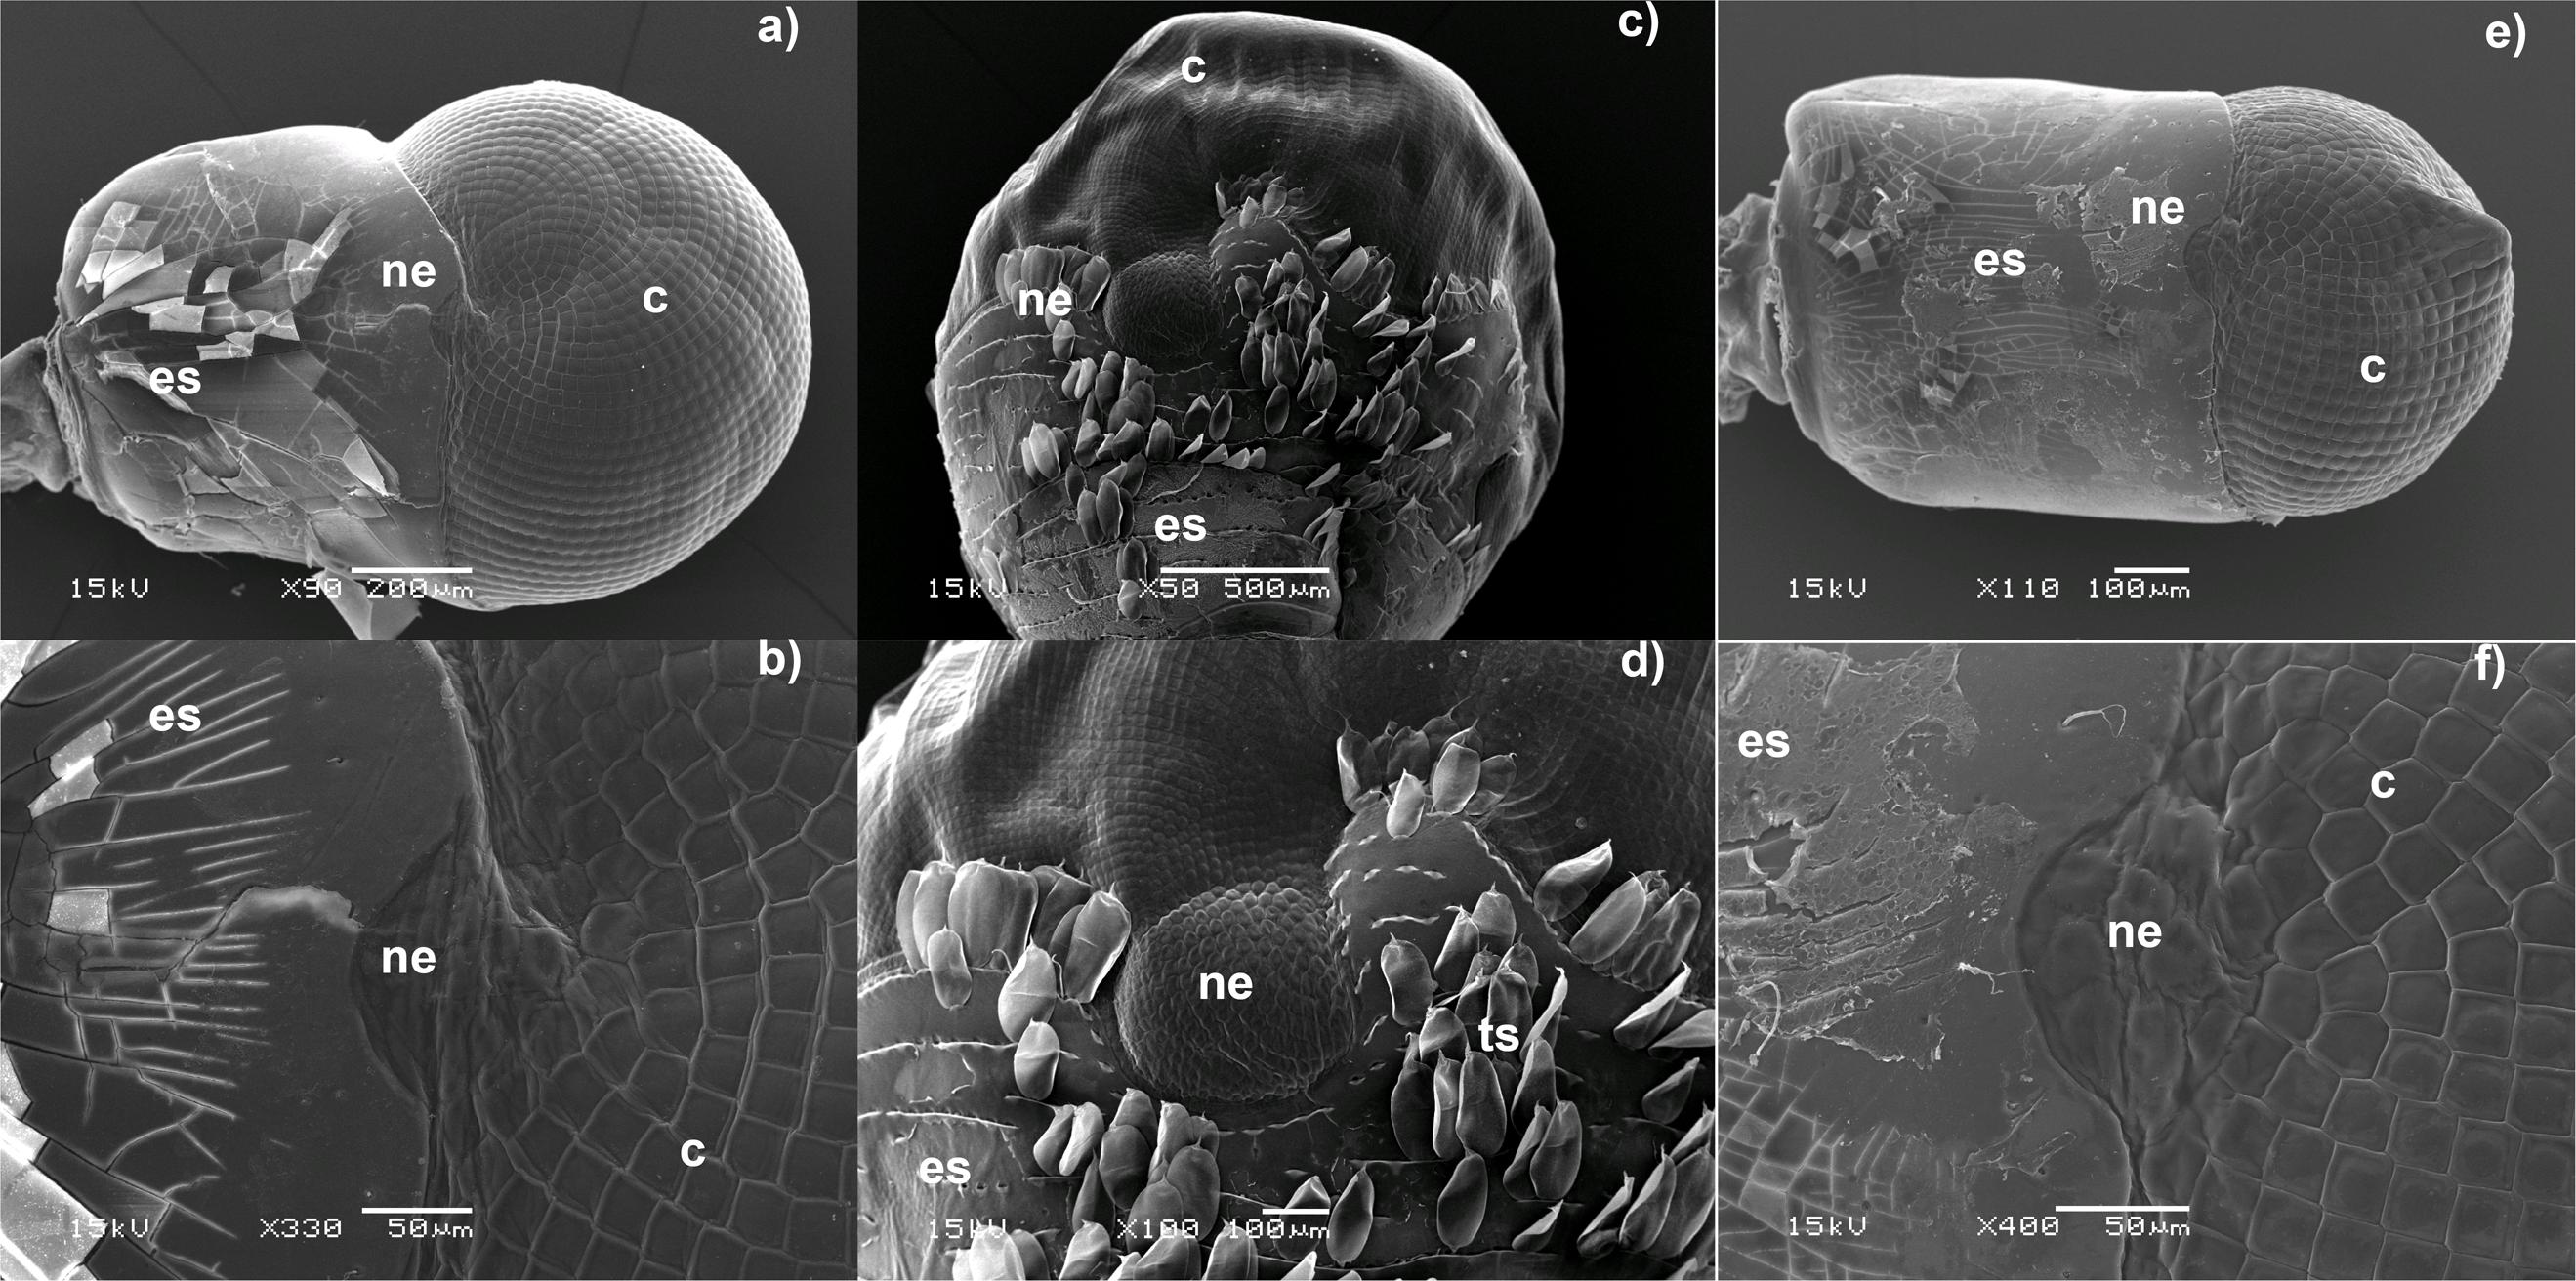 decapoda essay Sesarma angustipes (decapoda: grapsidae) mar  environment: essays on the  physiology of marine animals  armases ricordi and a roberti (decapoda.